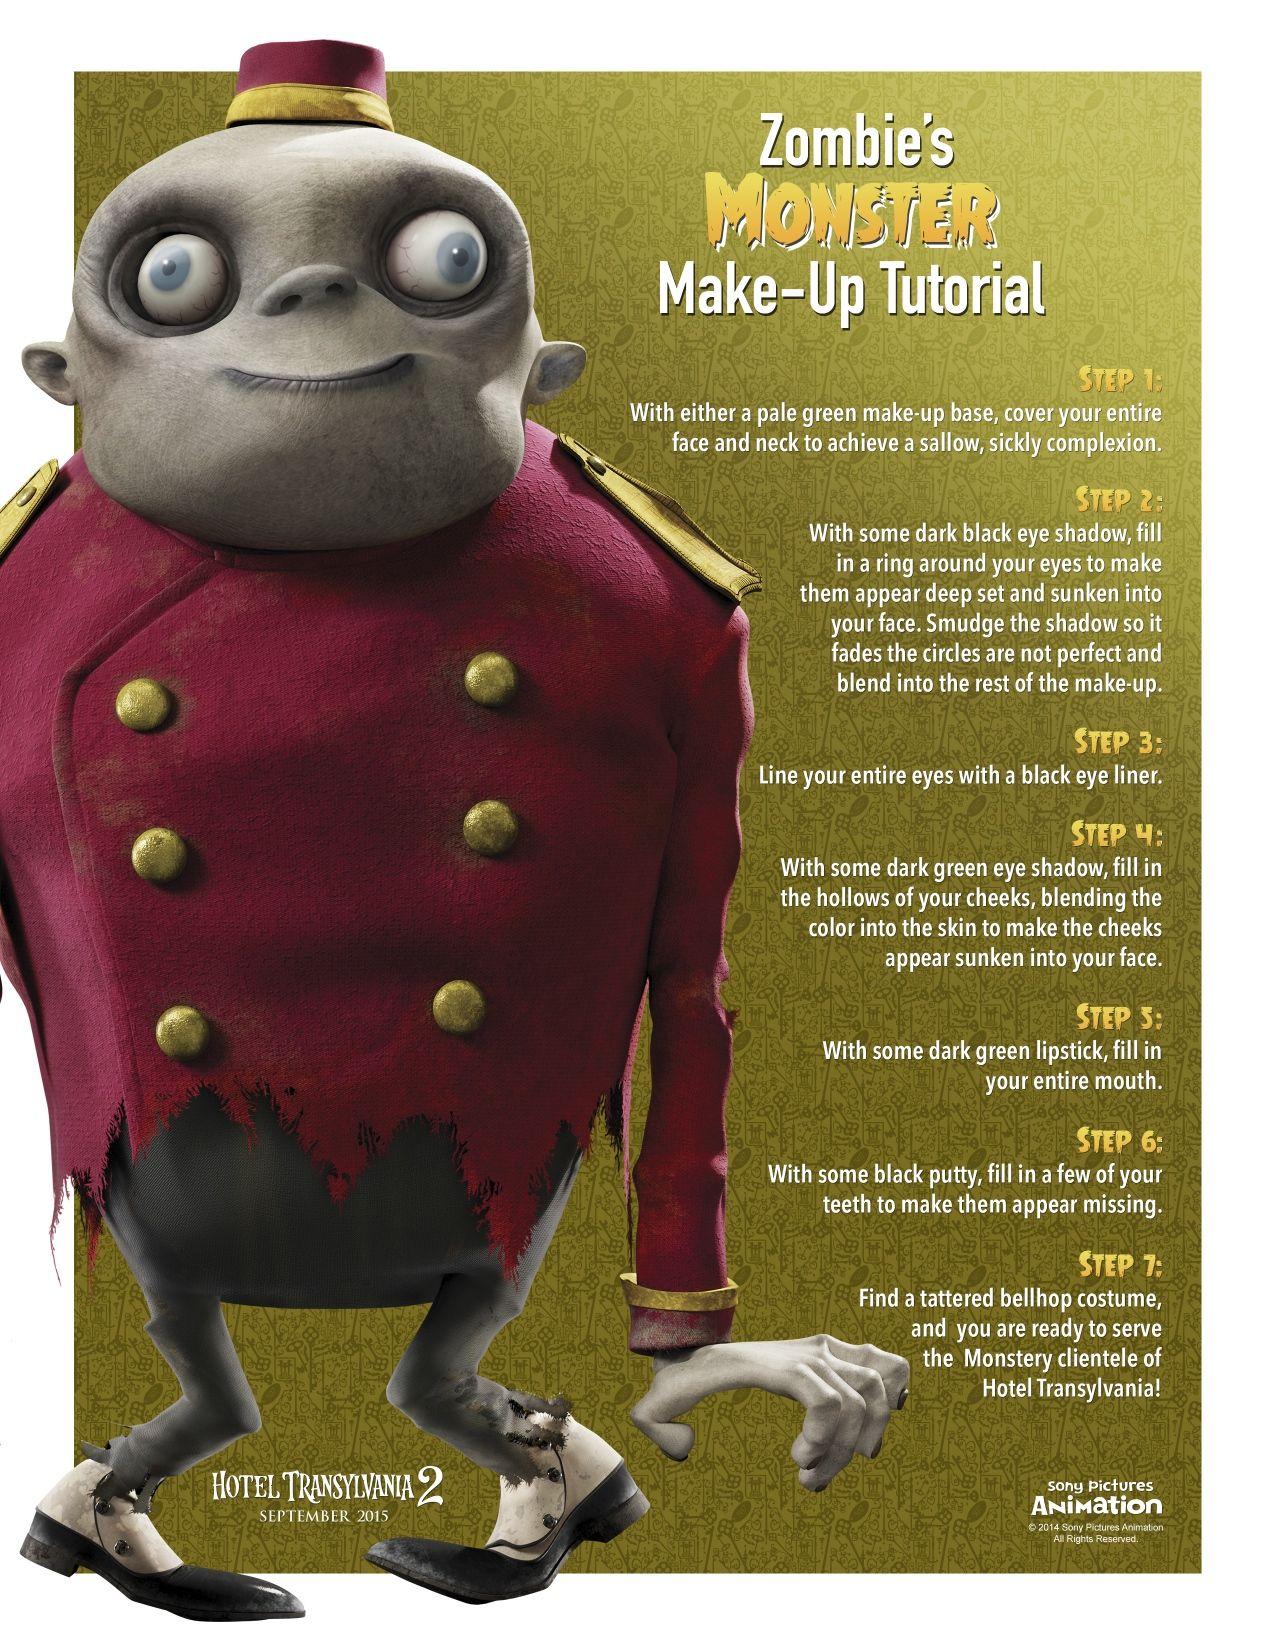 Hotel Transylvania 2 Zombie Monster Makeup Babies